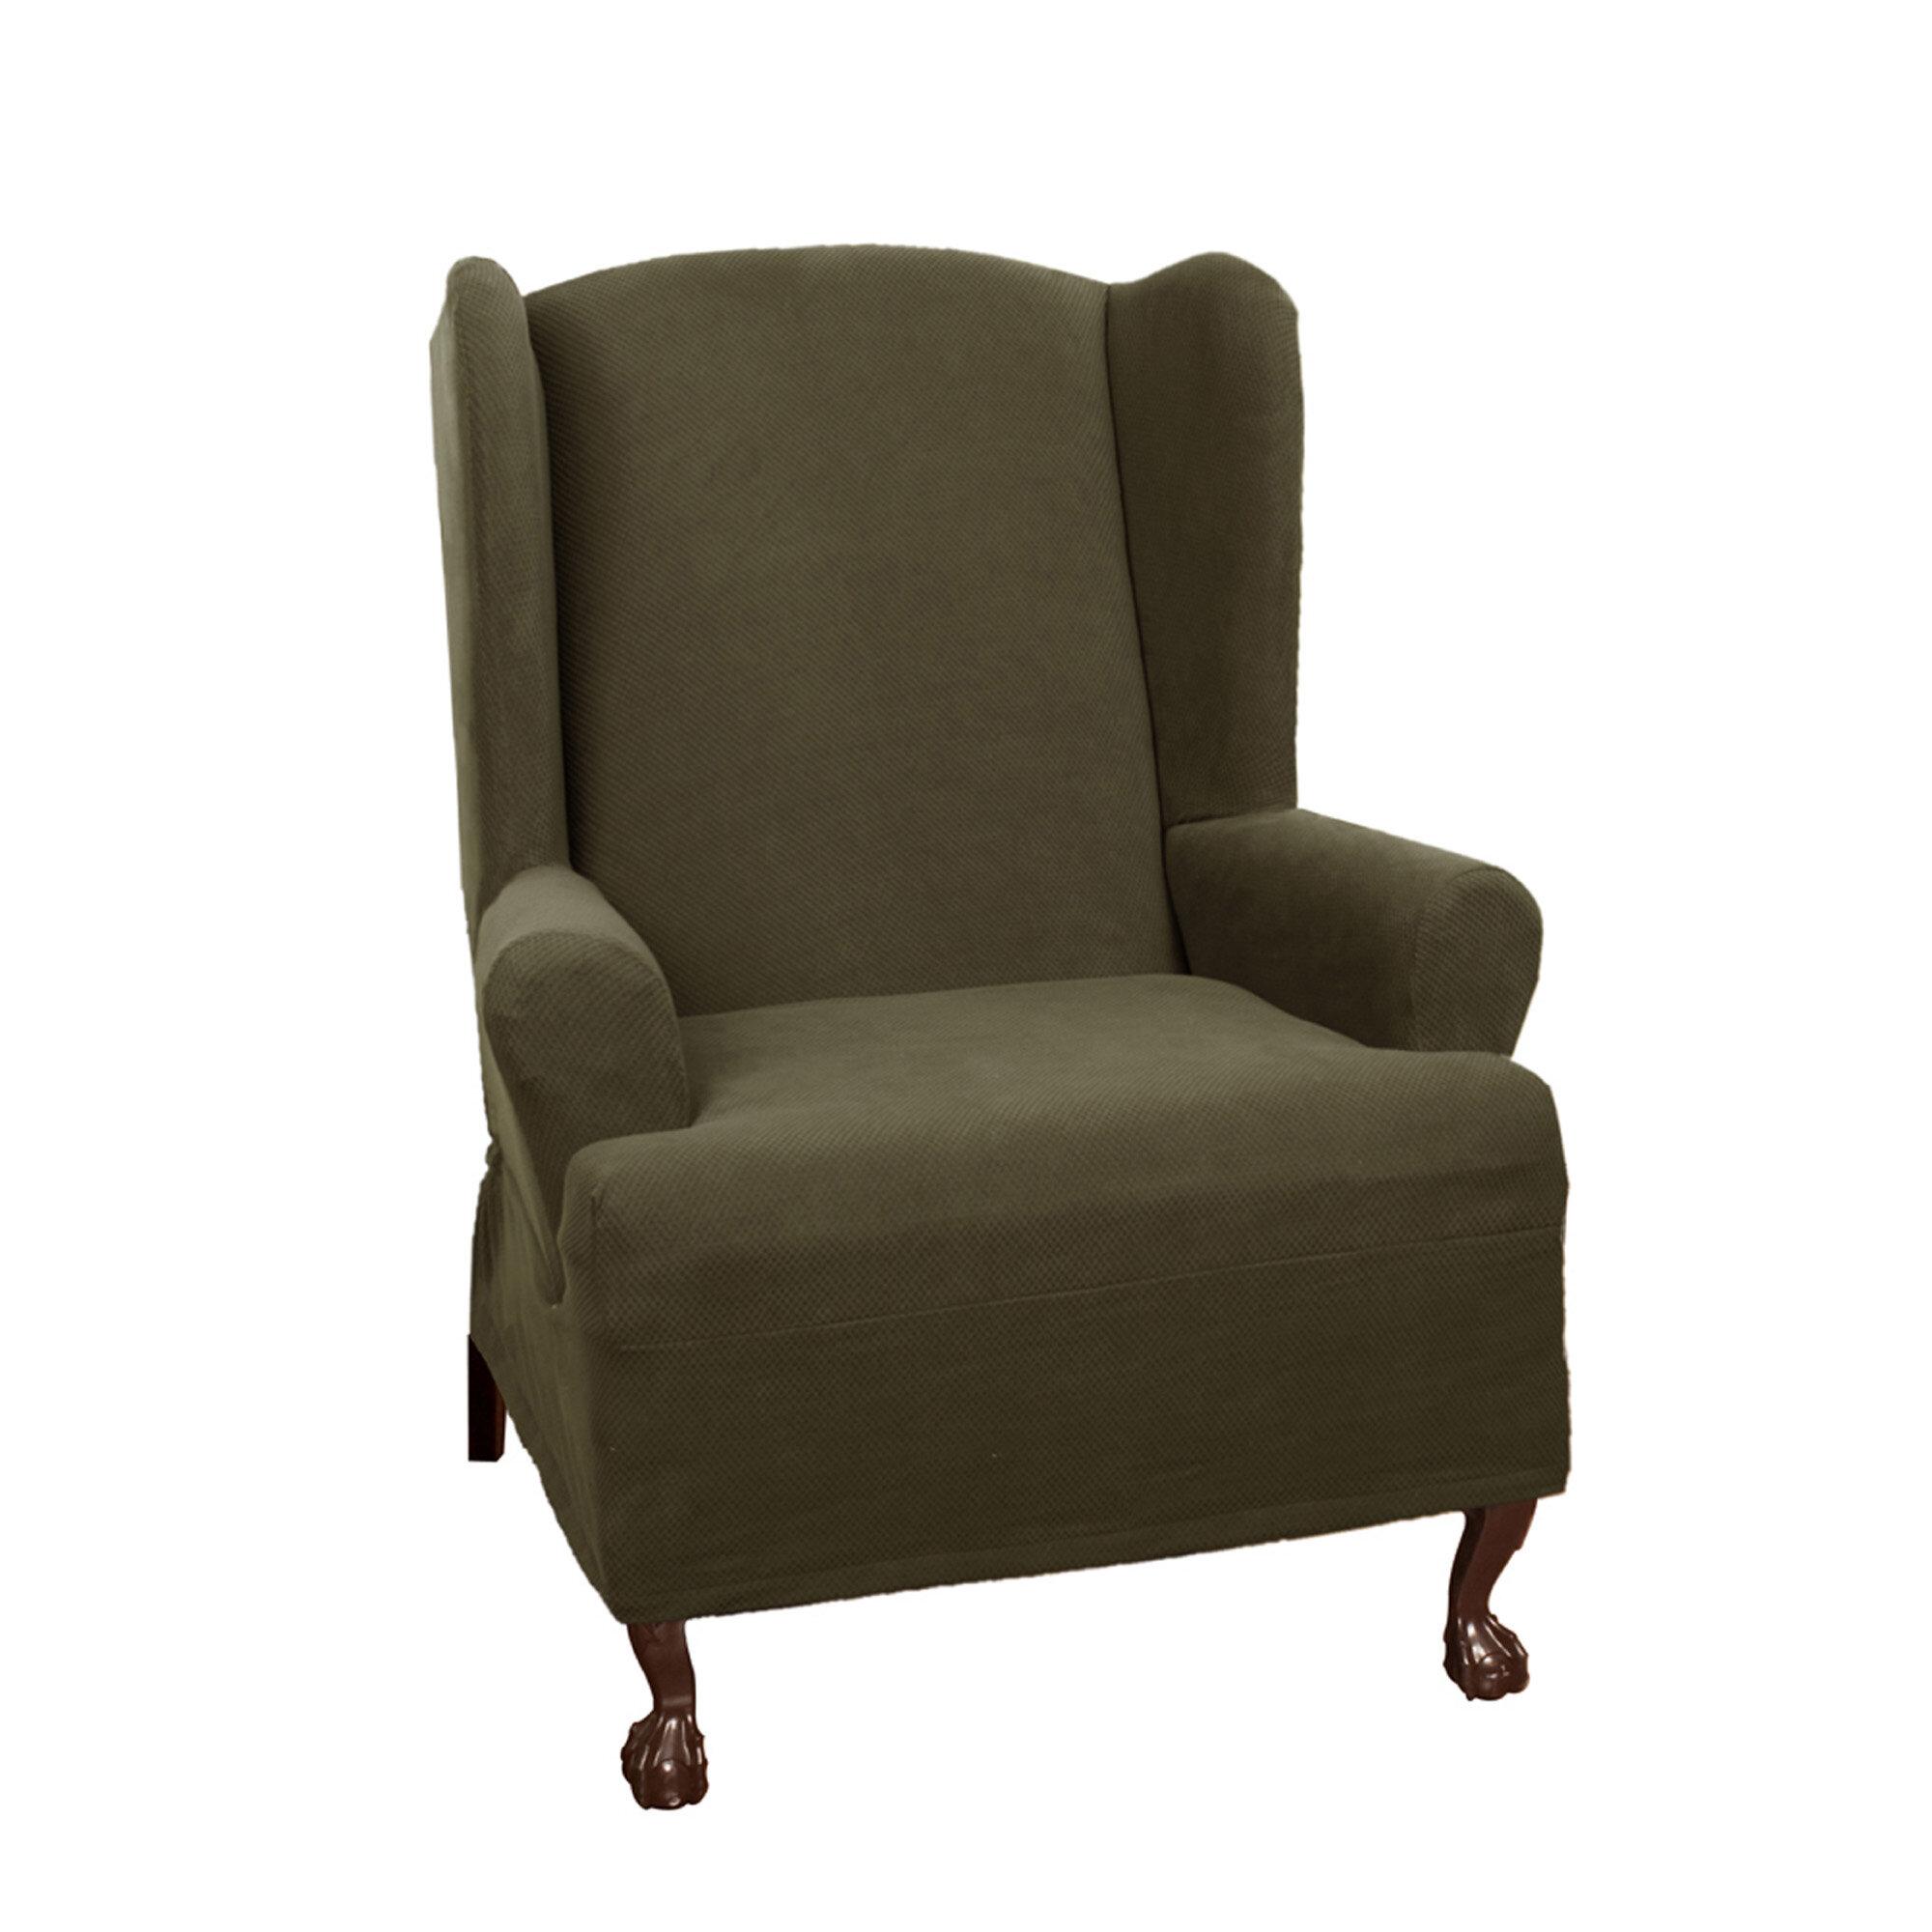 Maytex Pixel Stretch Wing Chair T Cushion Slipcover Ebay